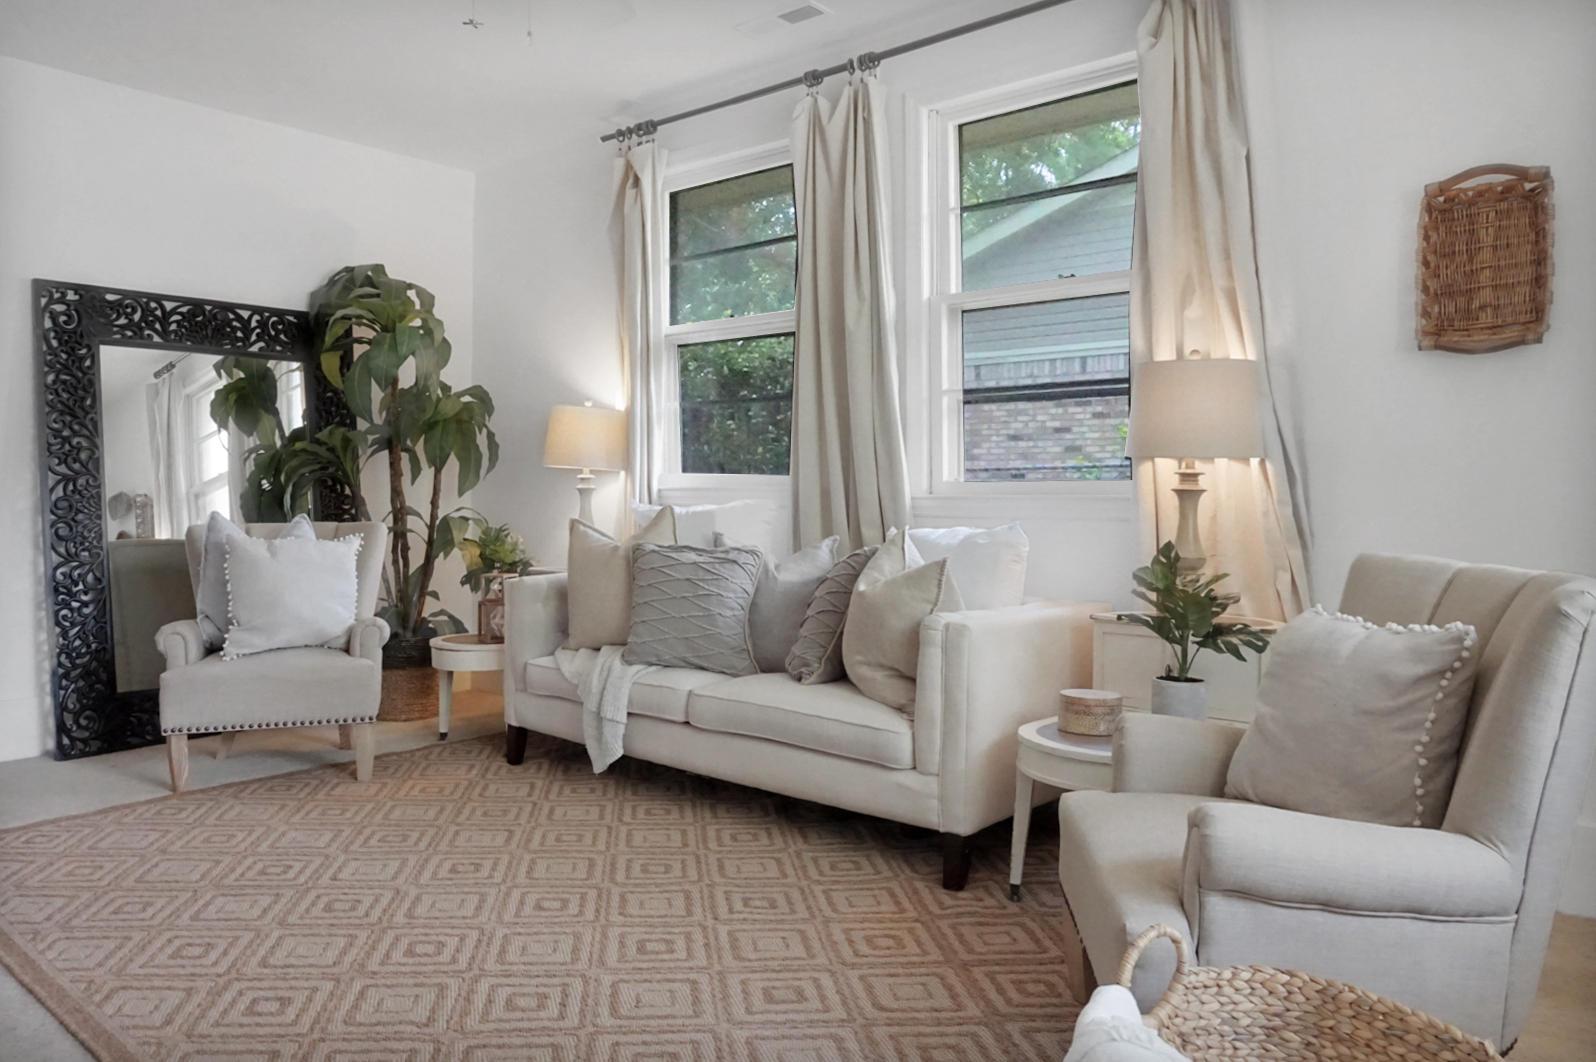 Oakland Homes For Sale - 408 Arlington, Charleston, SC - 25